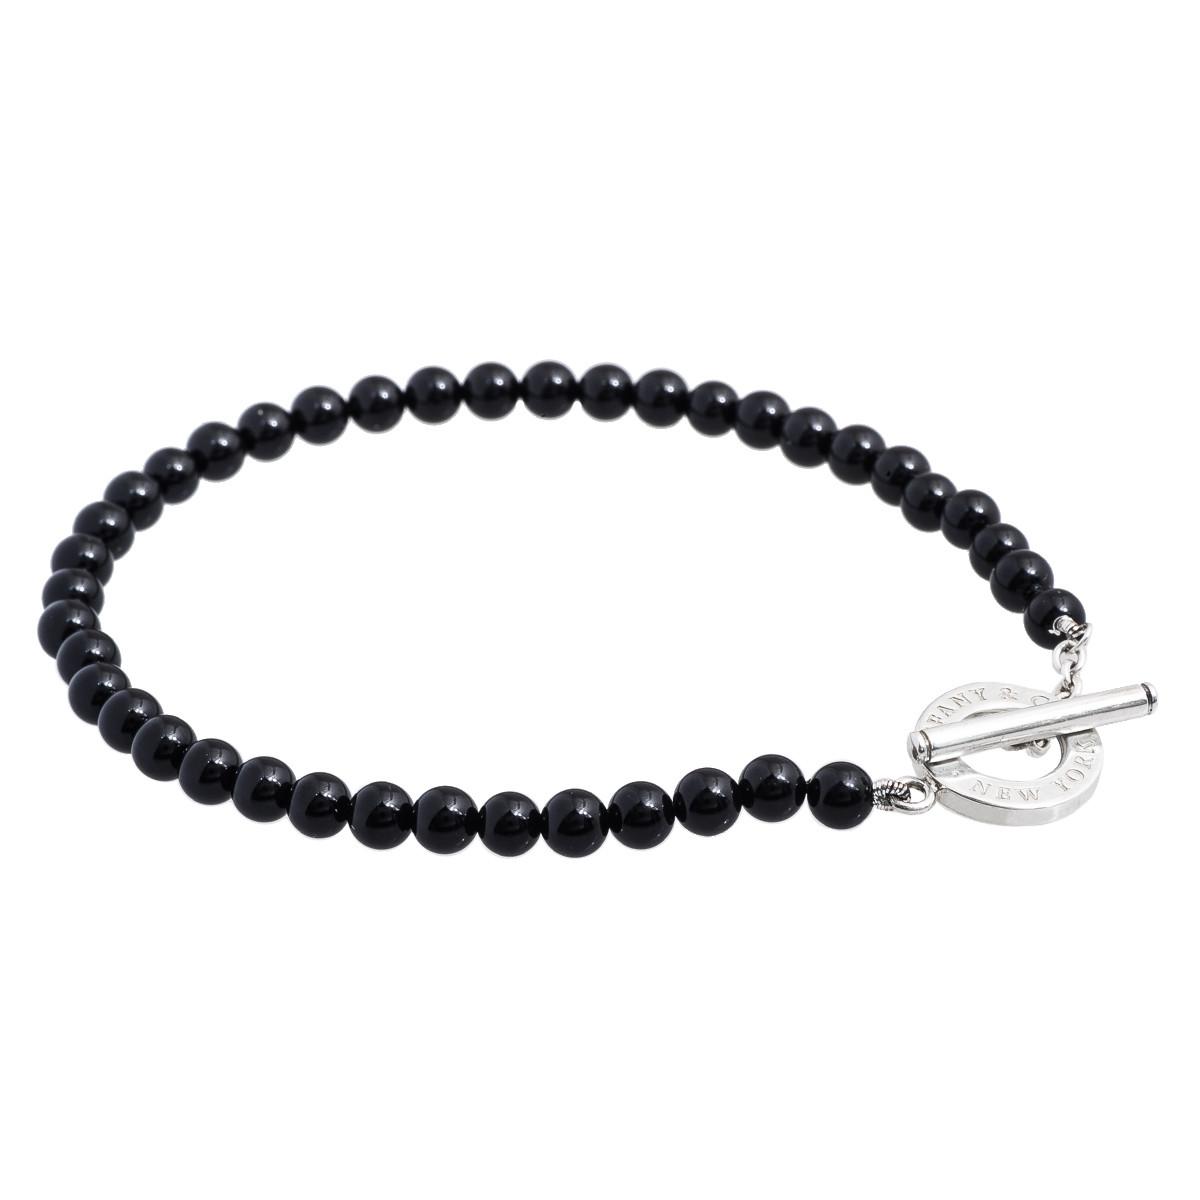 Black Onyx Bead Bracelet Gallery Image